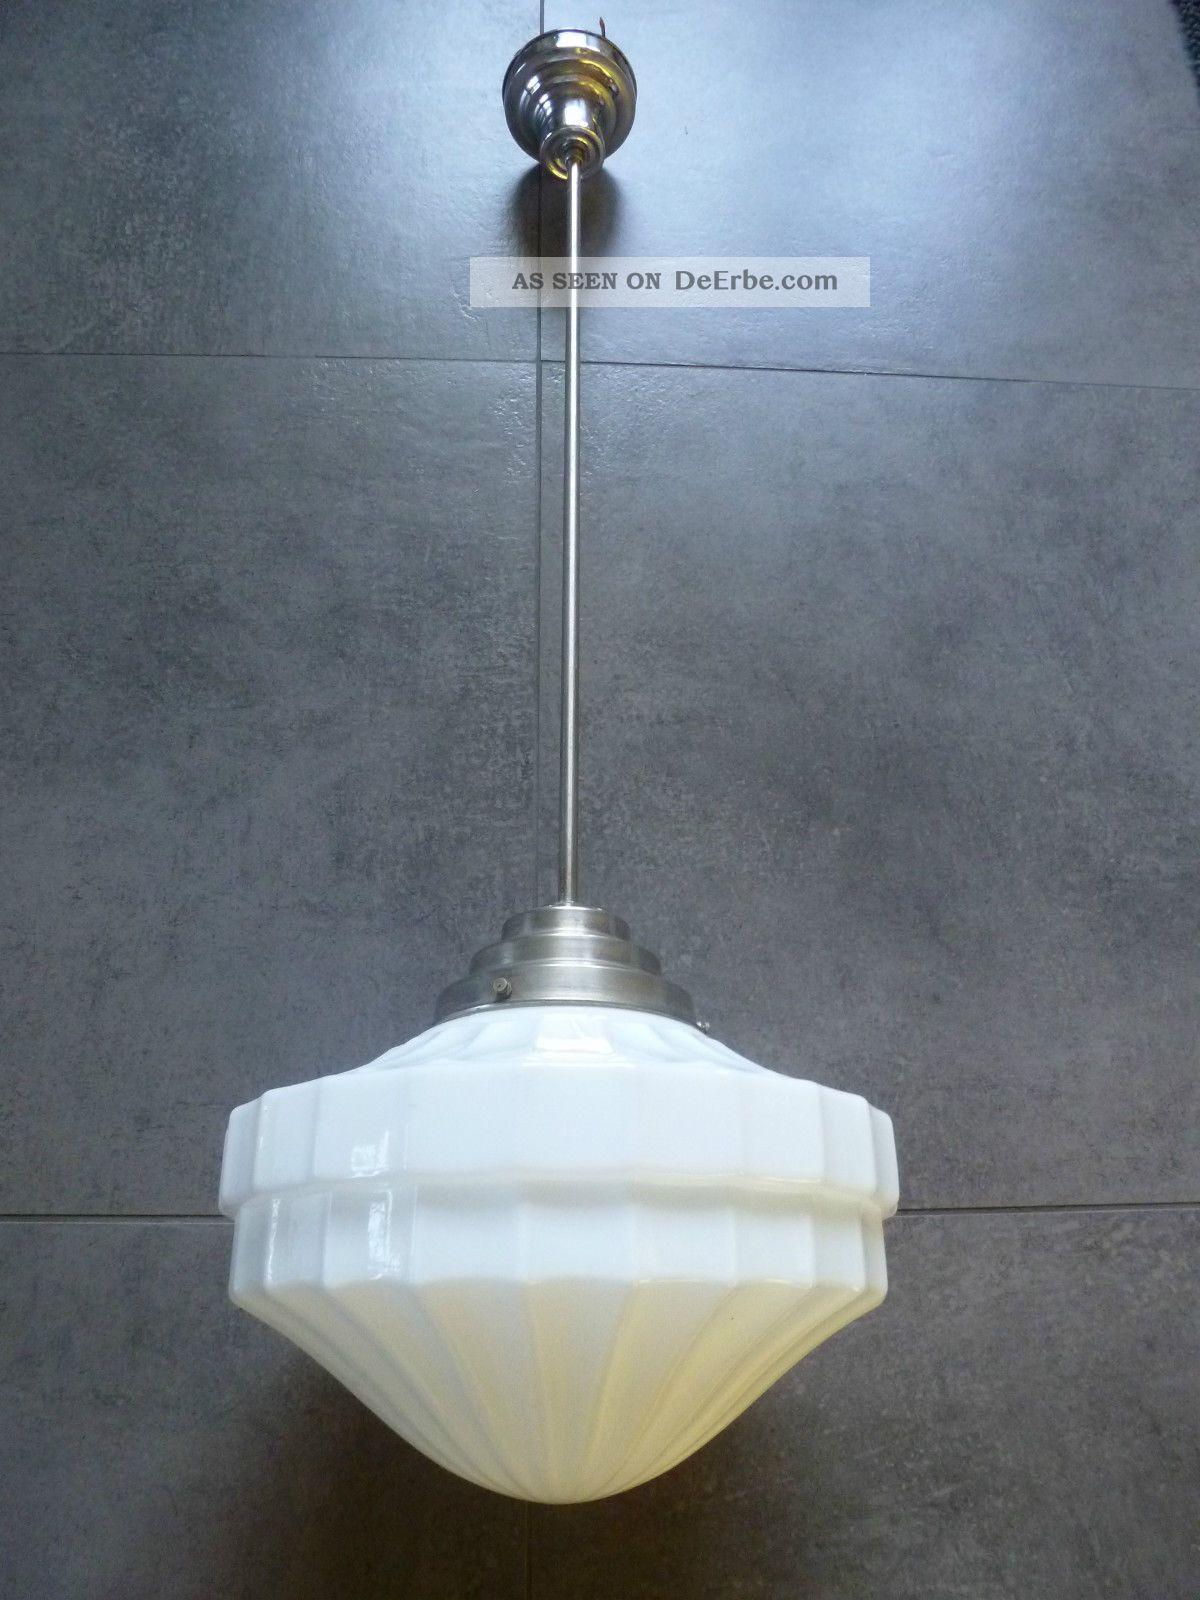 nobel bauhaus 1930 deckenlampe art deco lampe lamp wei glas chrom stange. Black Bedroom Furniture Sets. Home Design Ideas